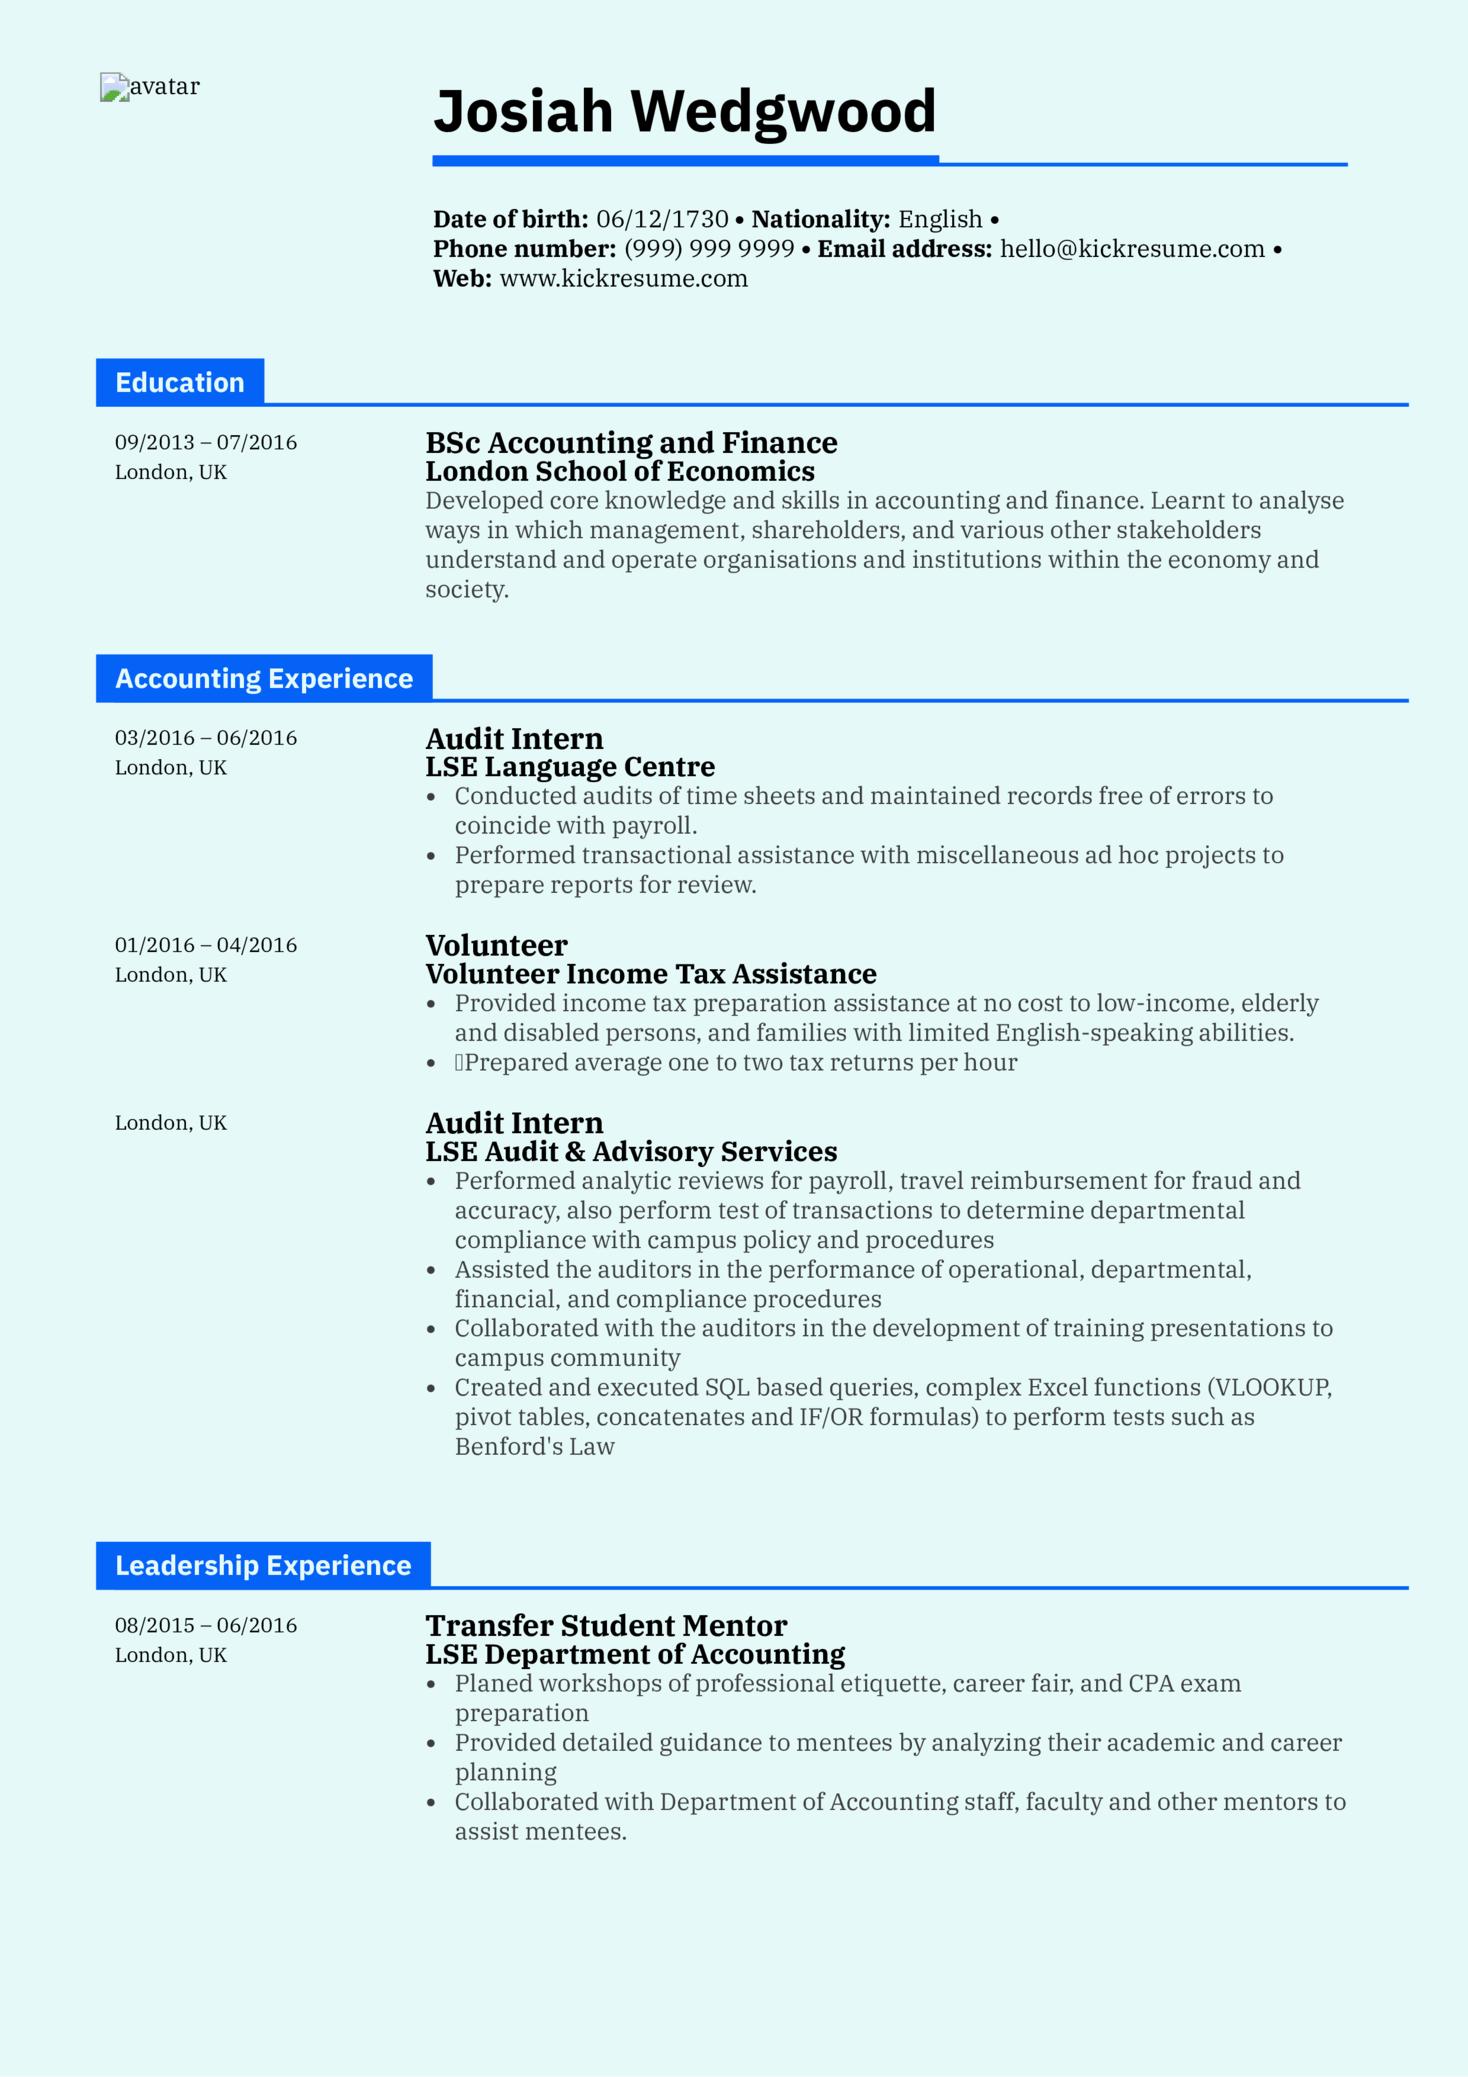 Graduate Accountant Resume Sample (Teil 1)